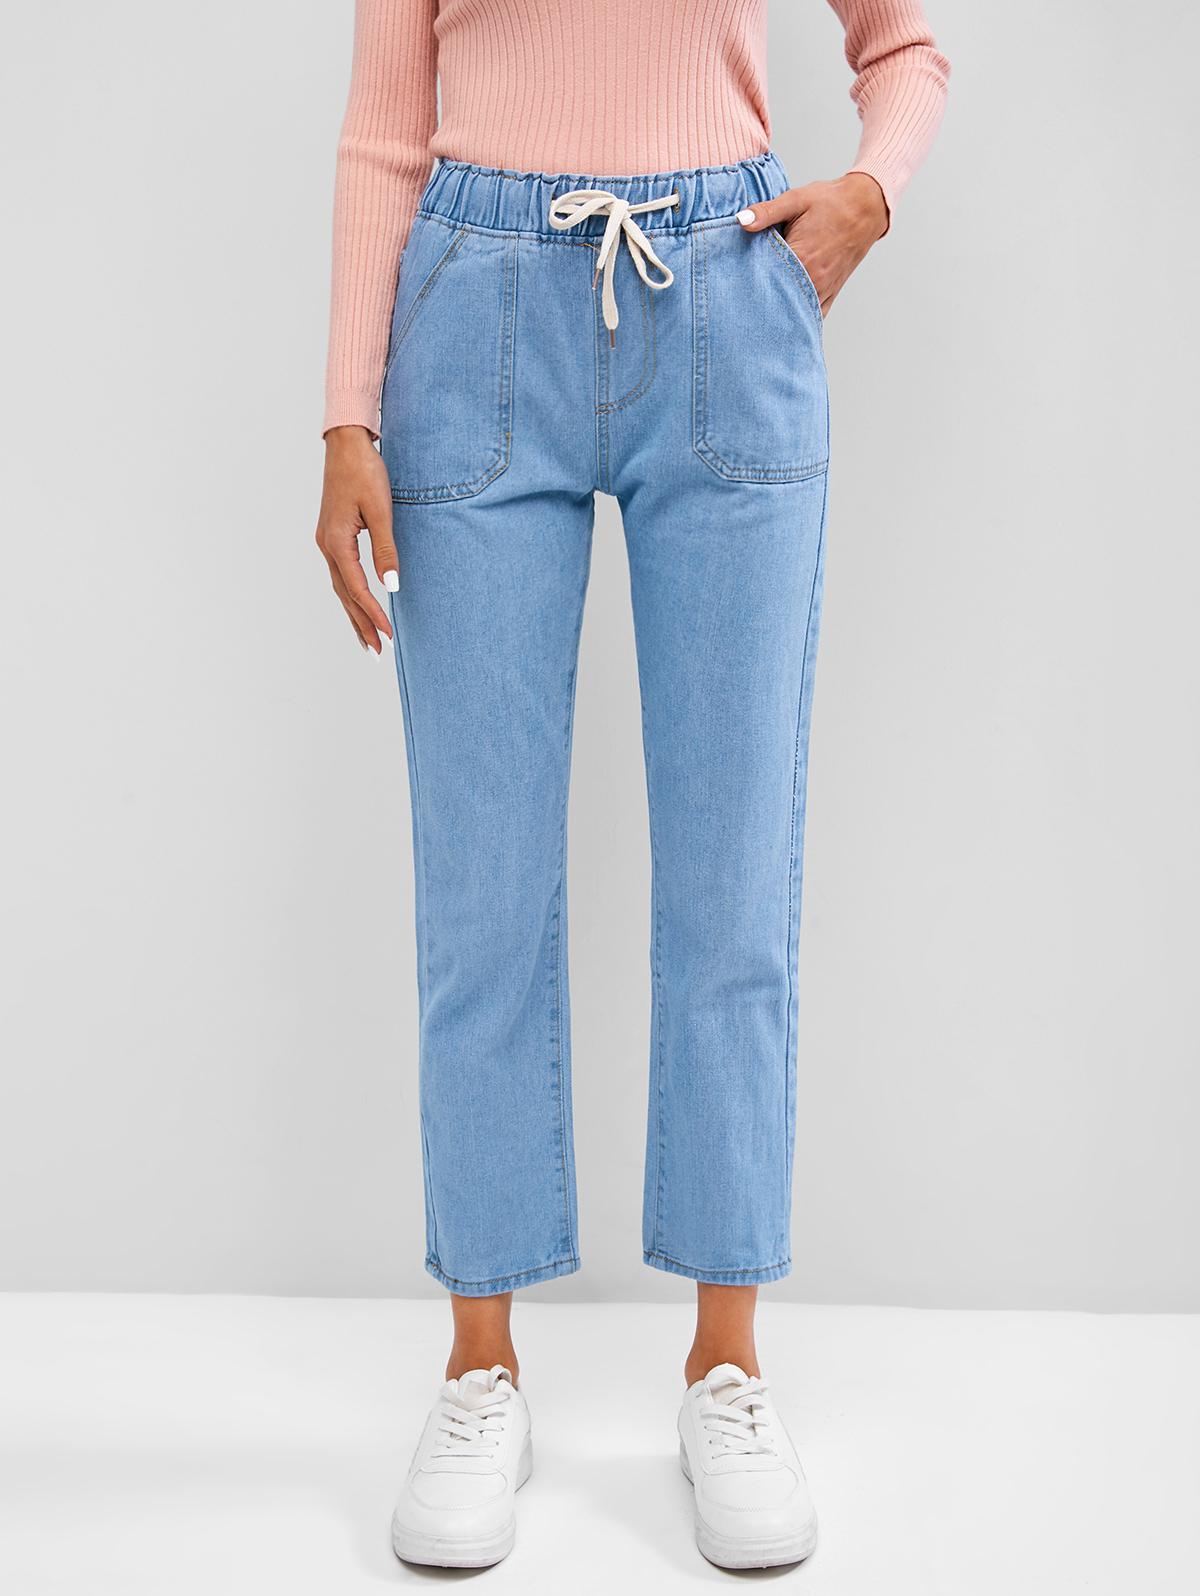 Drawstring Pocket Stovepipe Jeans